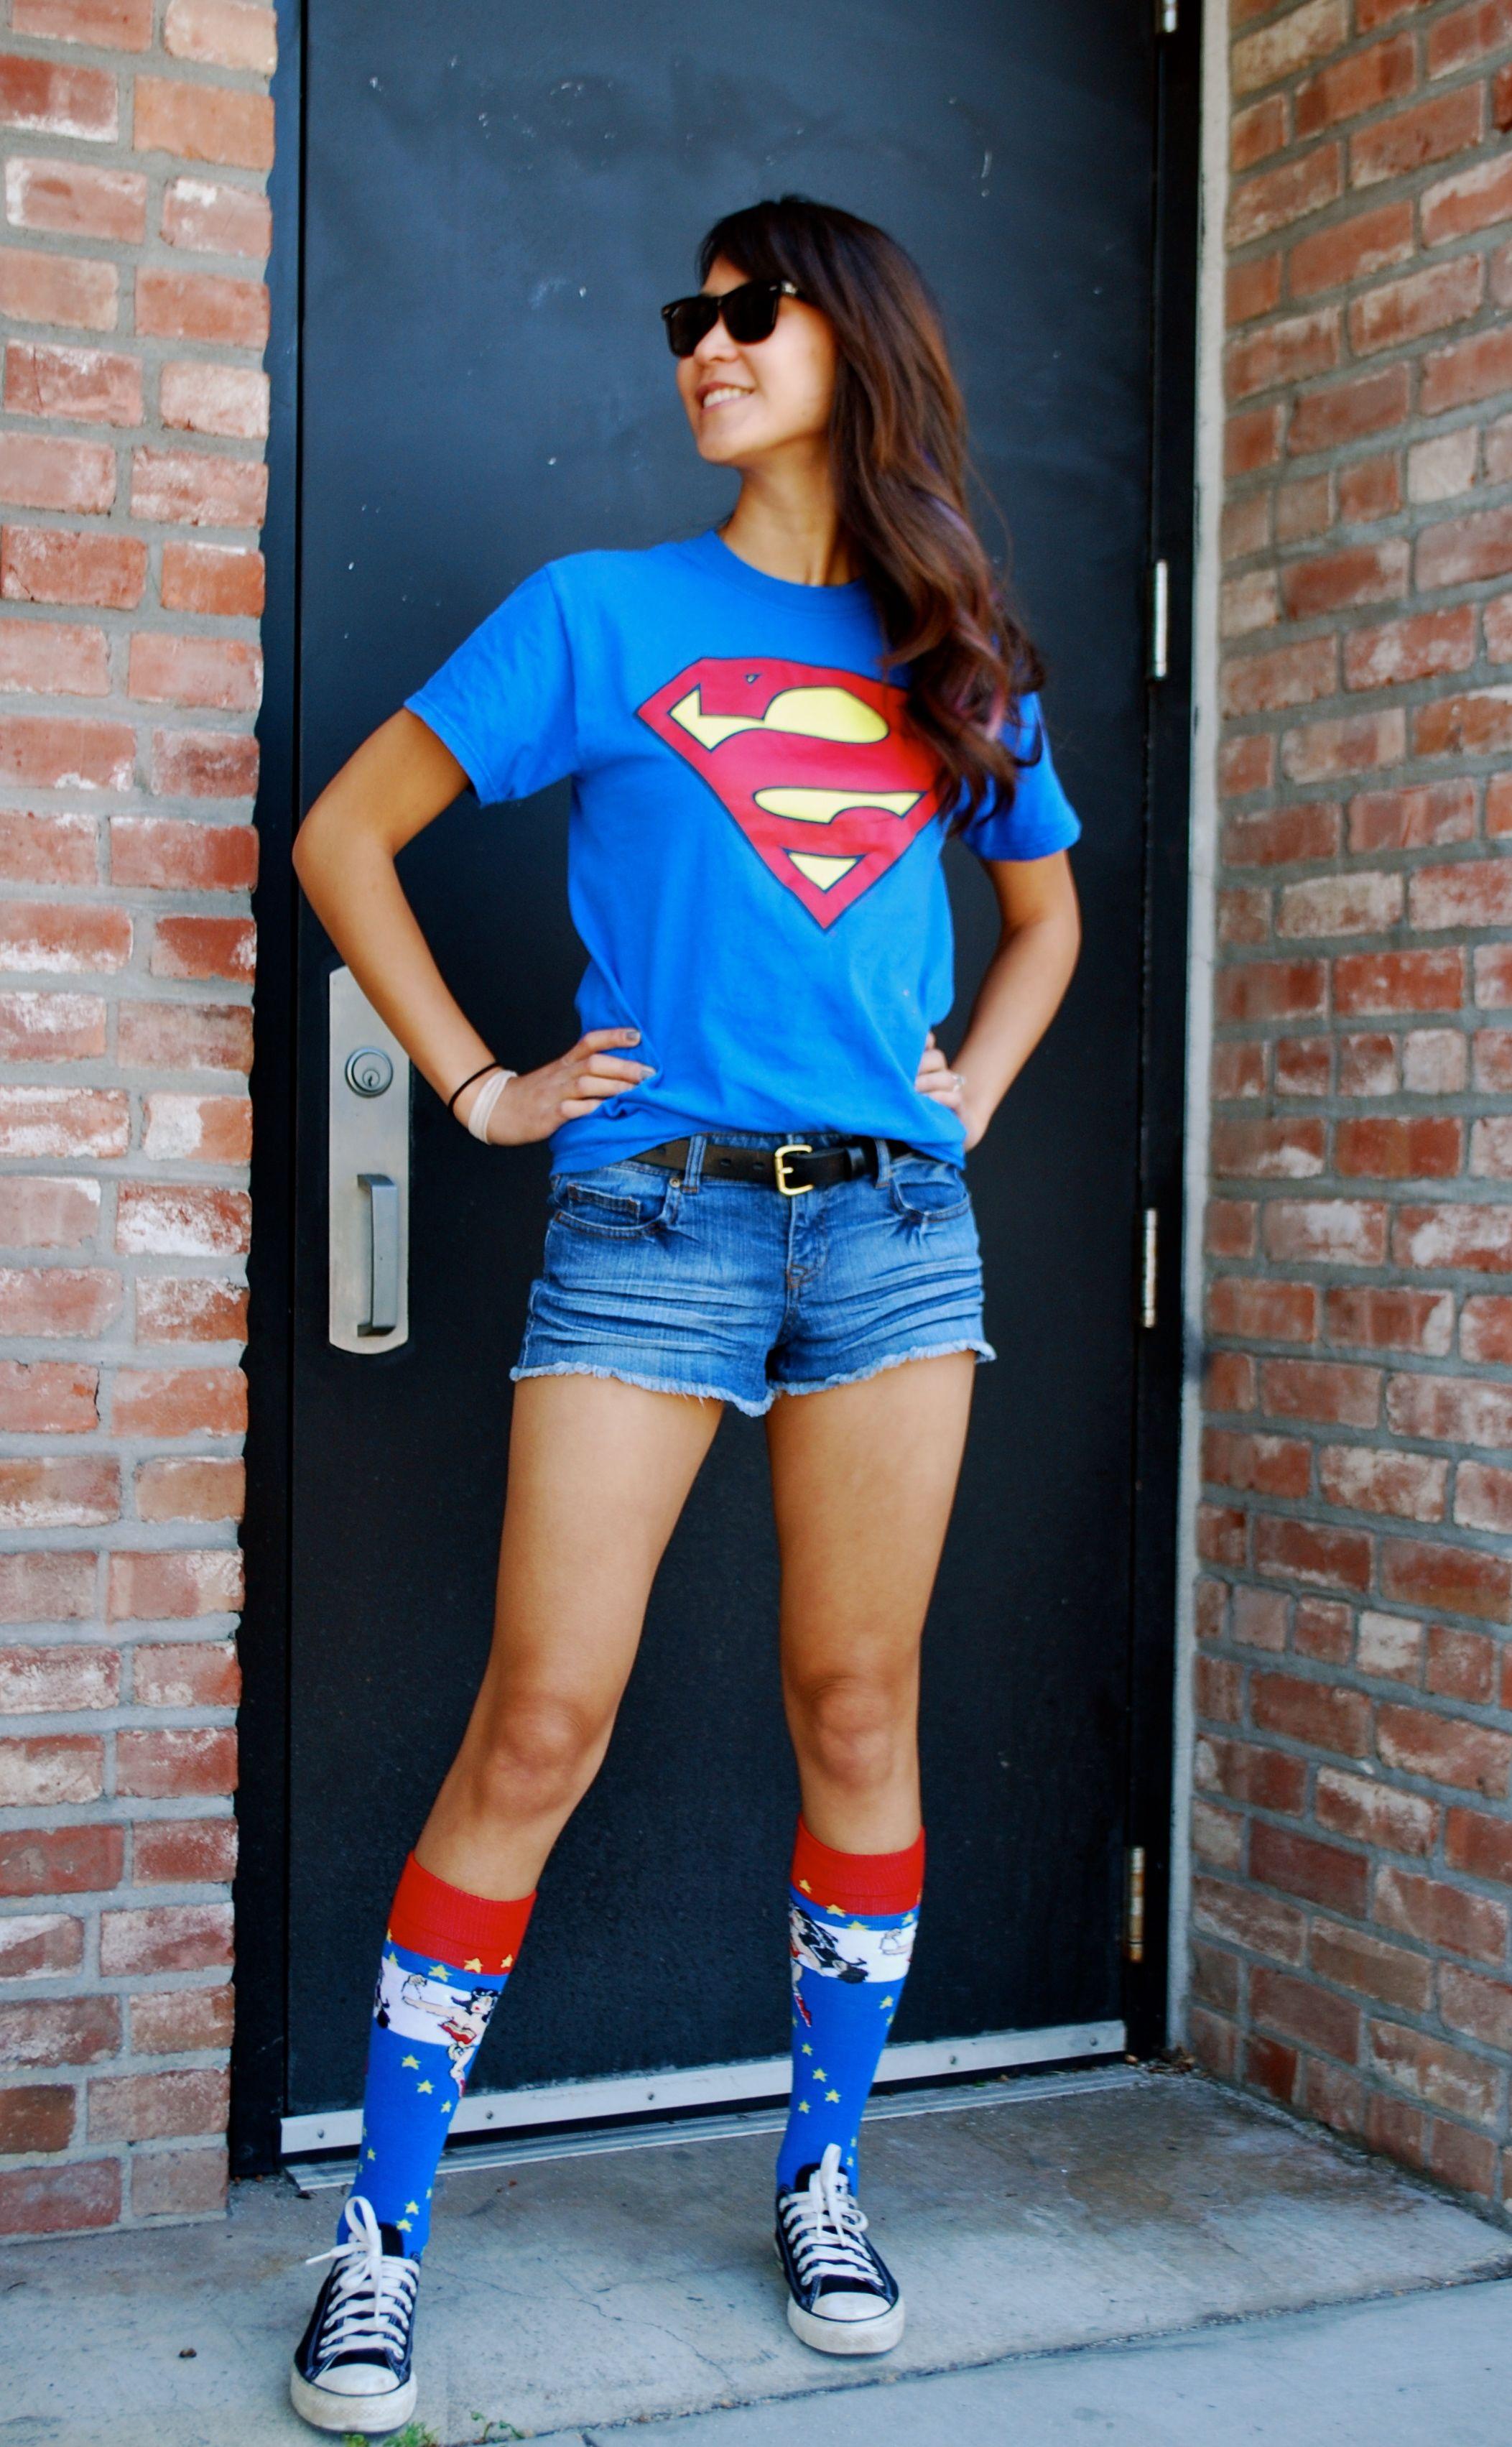 Comic Fest Outfit - Superman shirt and Wonder Woman socks